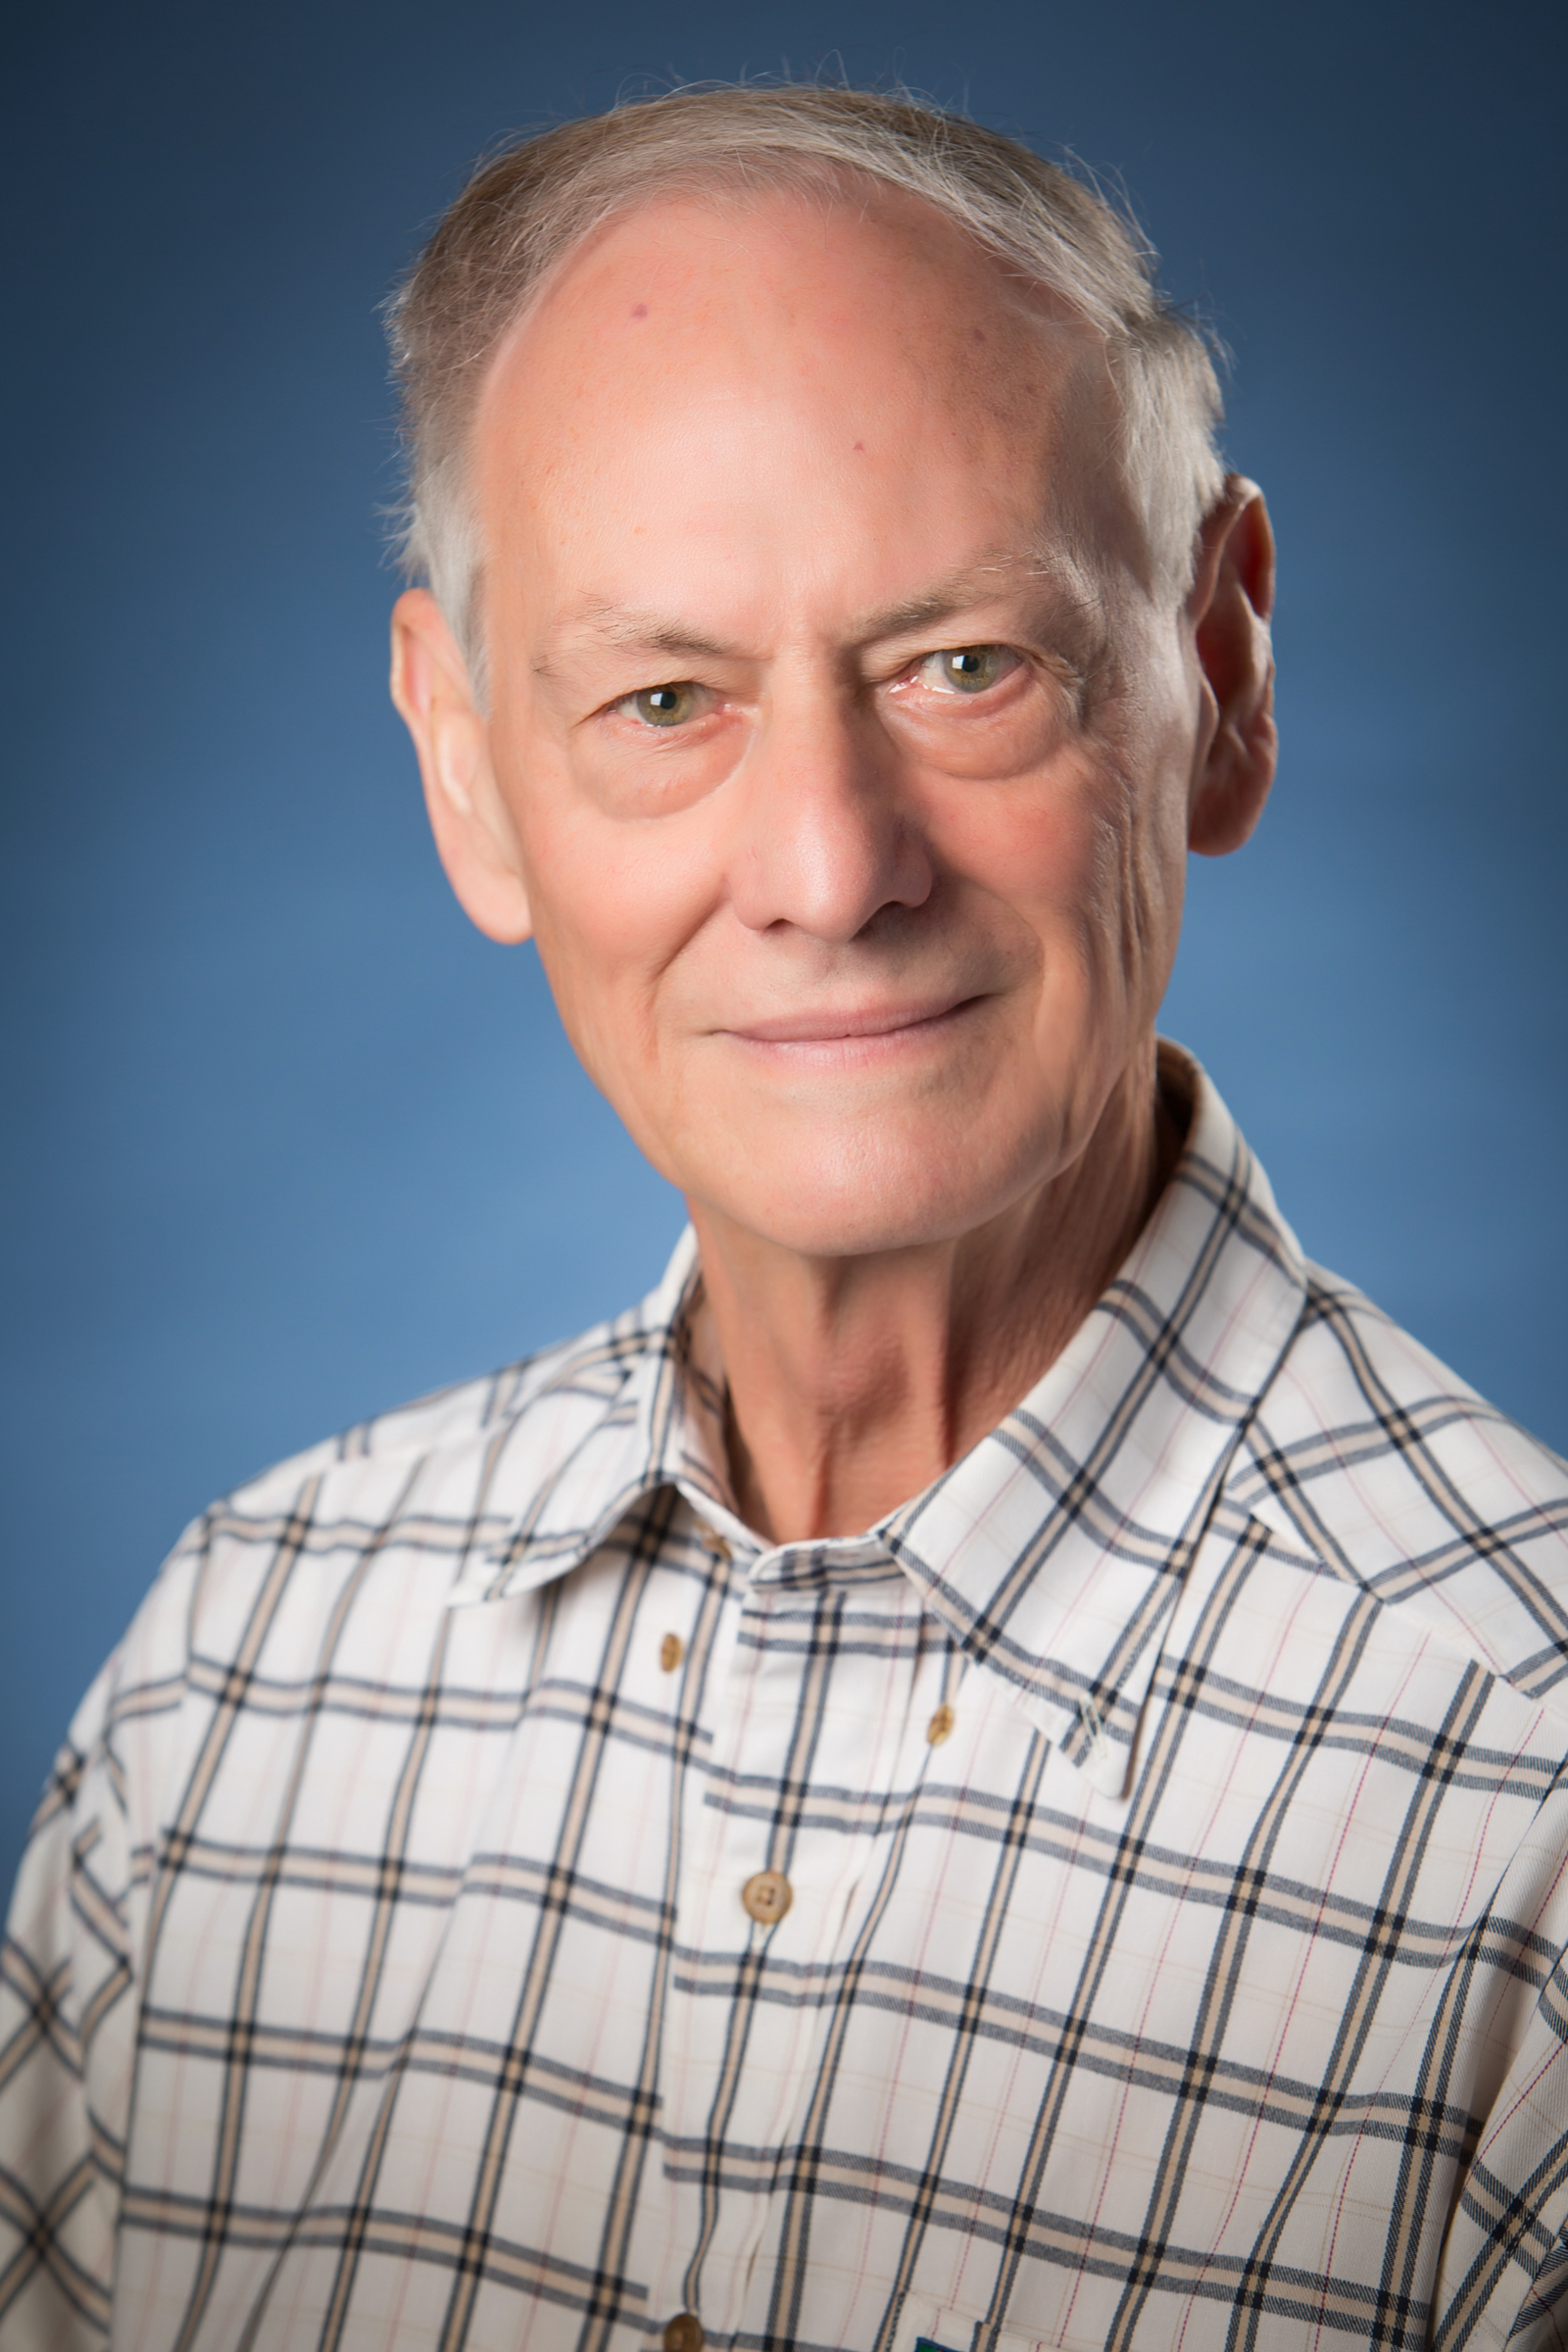 David Newcomer, IV